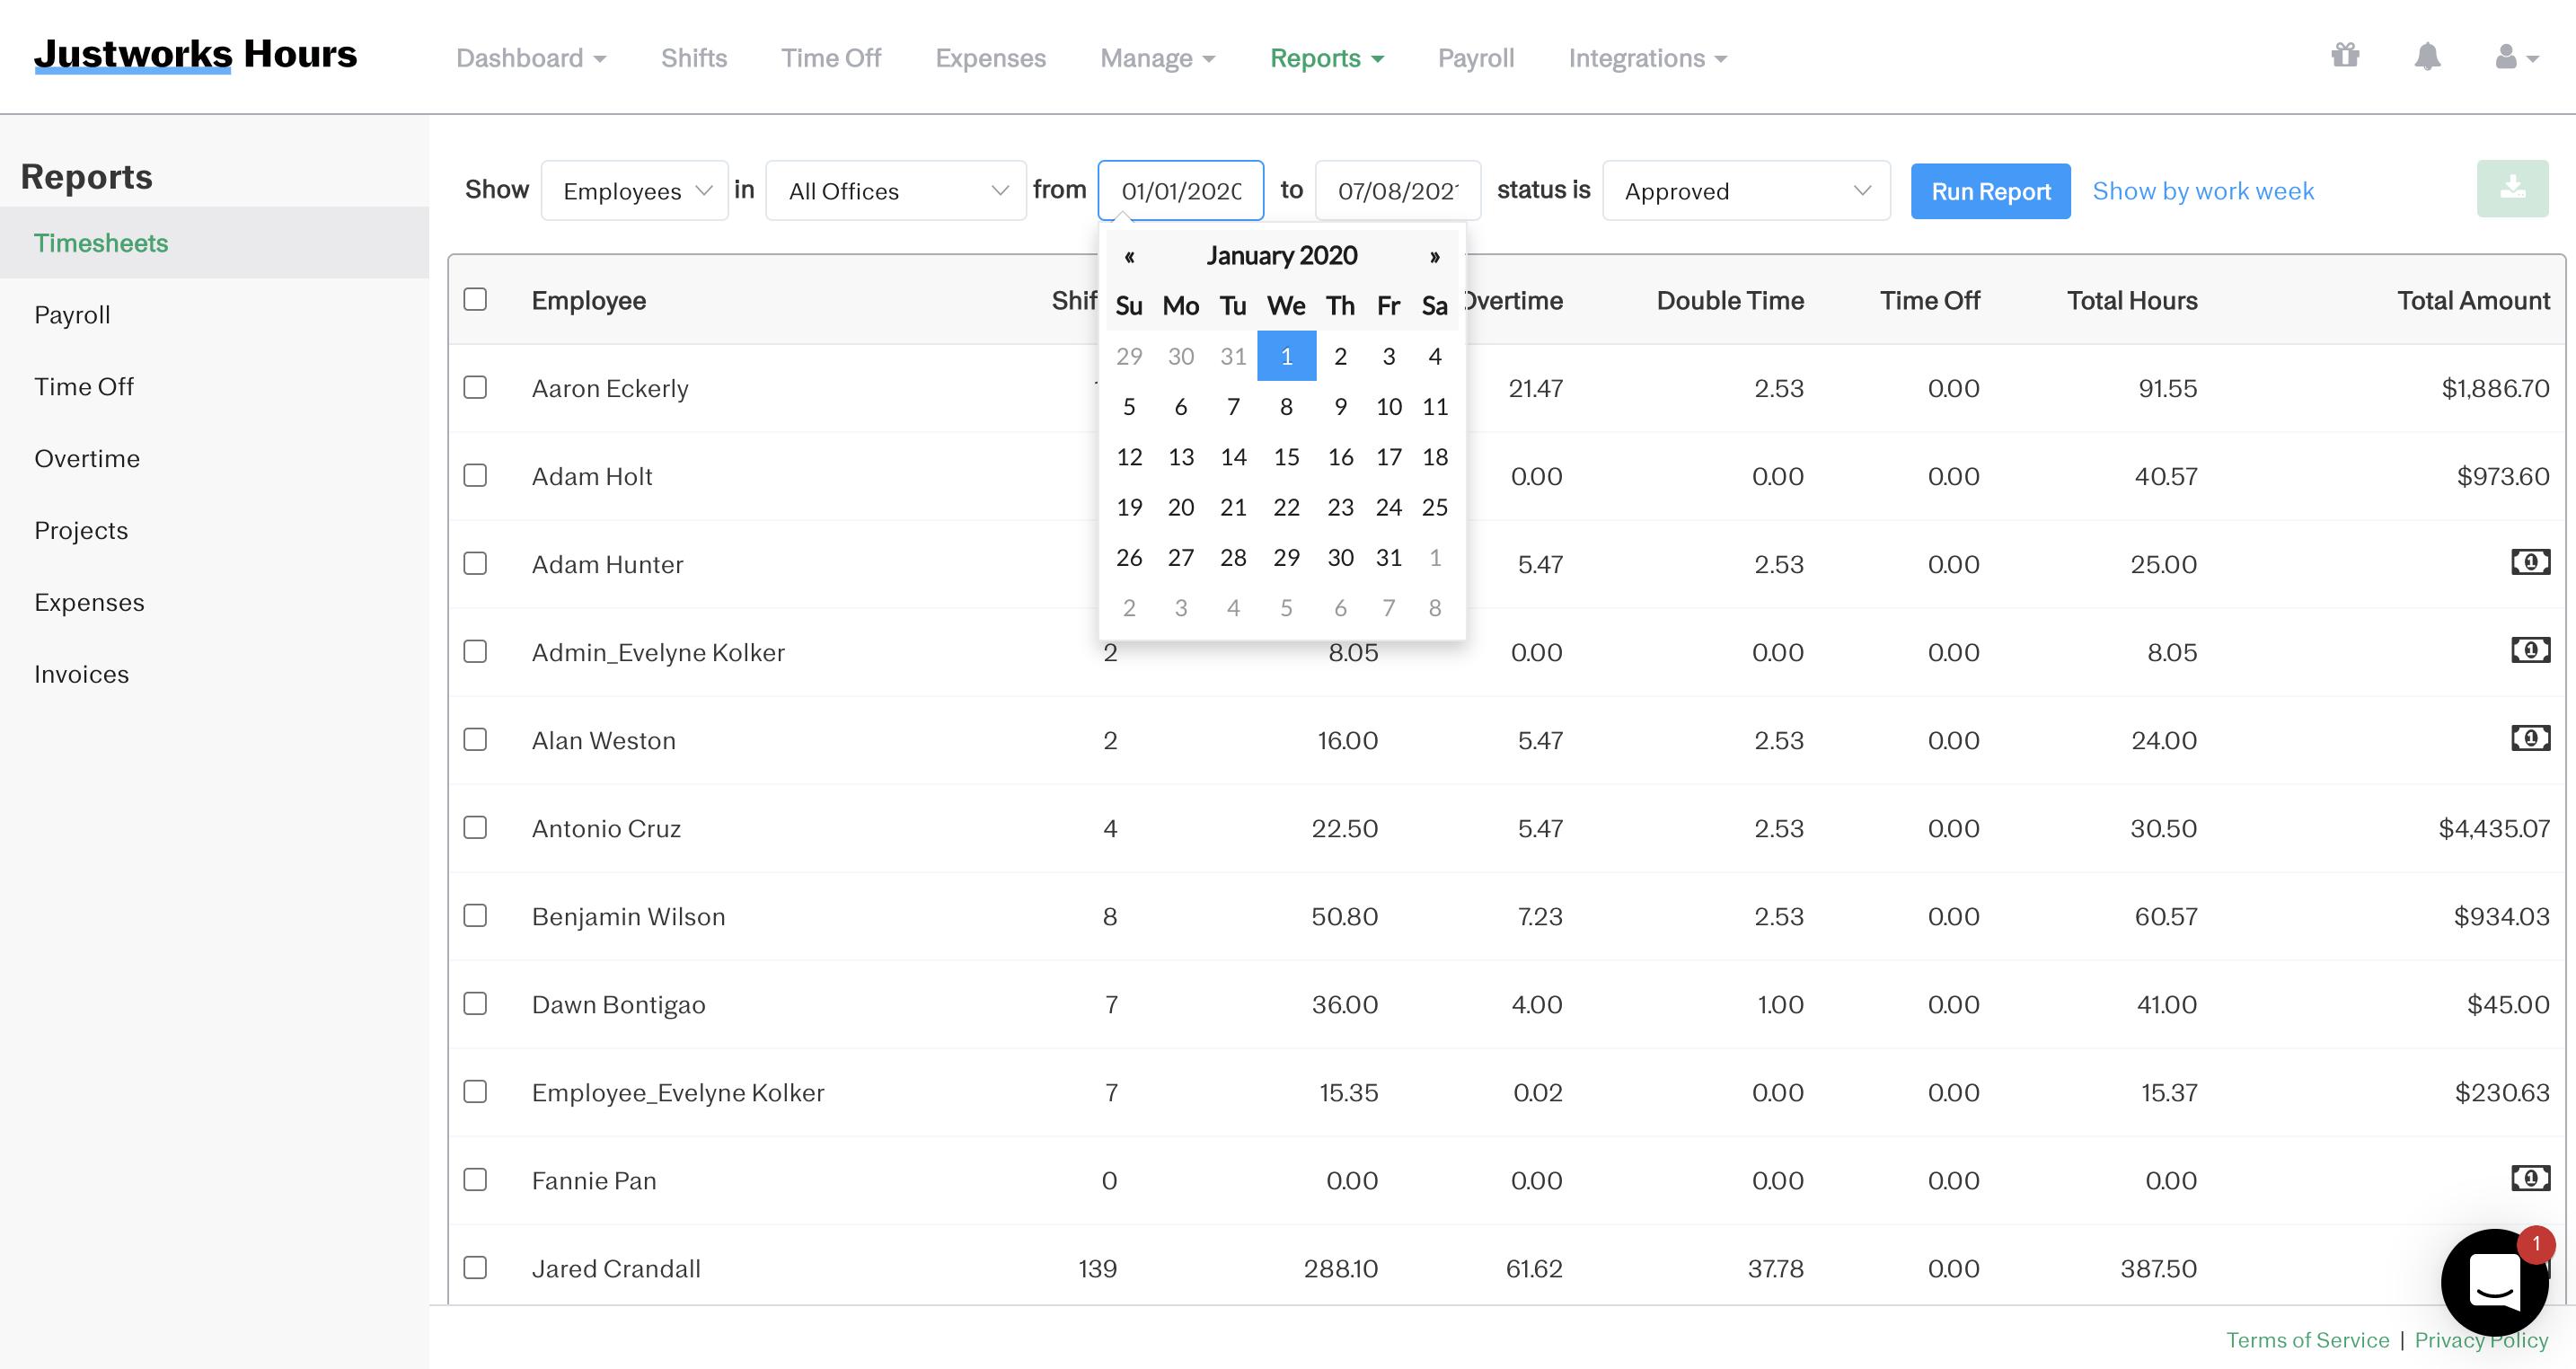 Screenshot showing how to run the time sheet report for custom date range